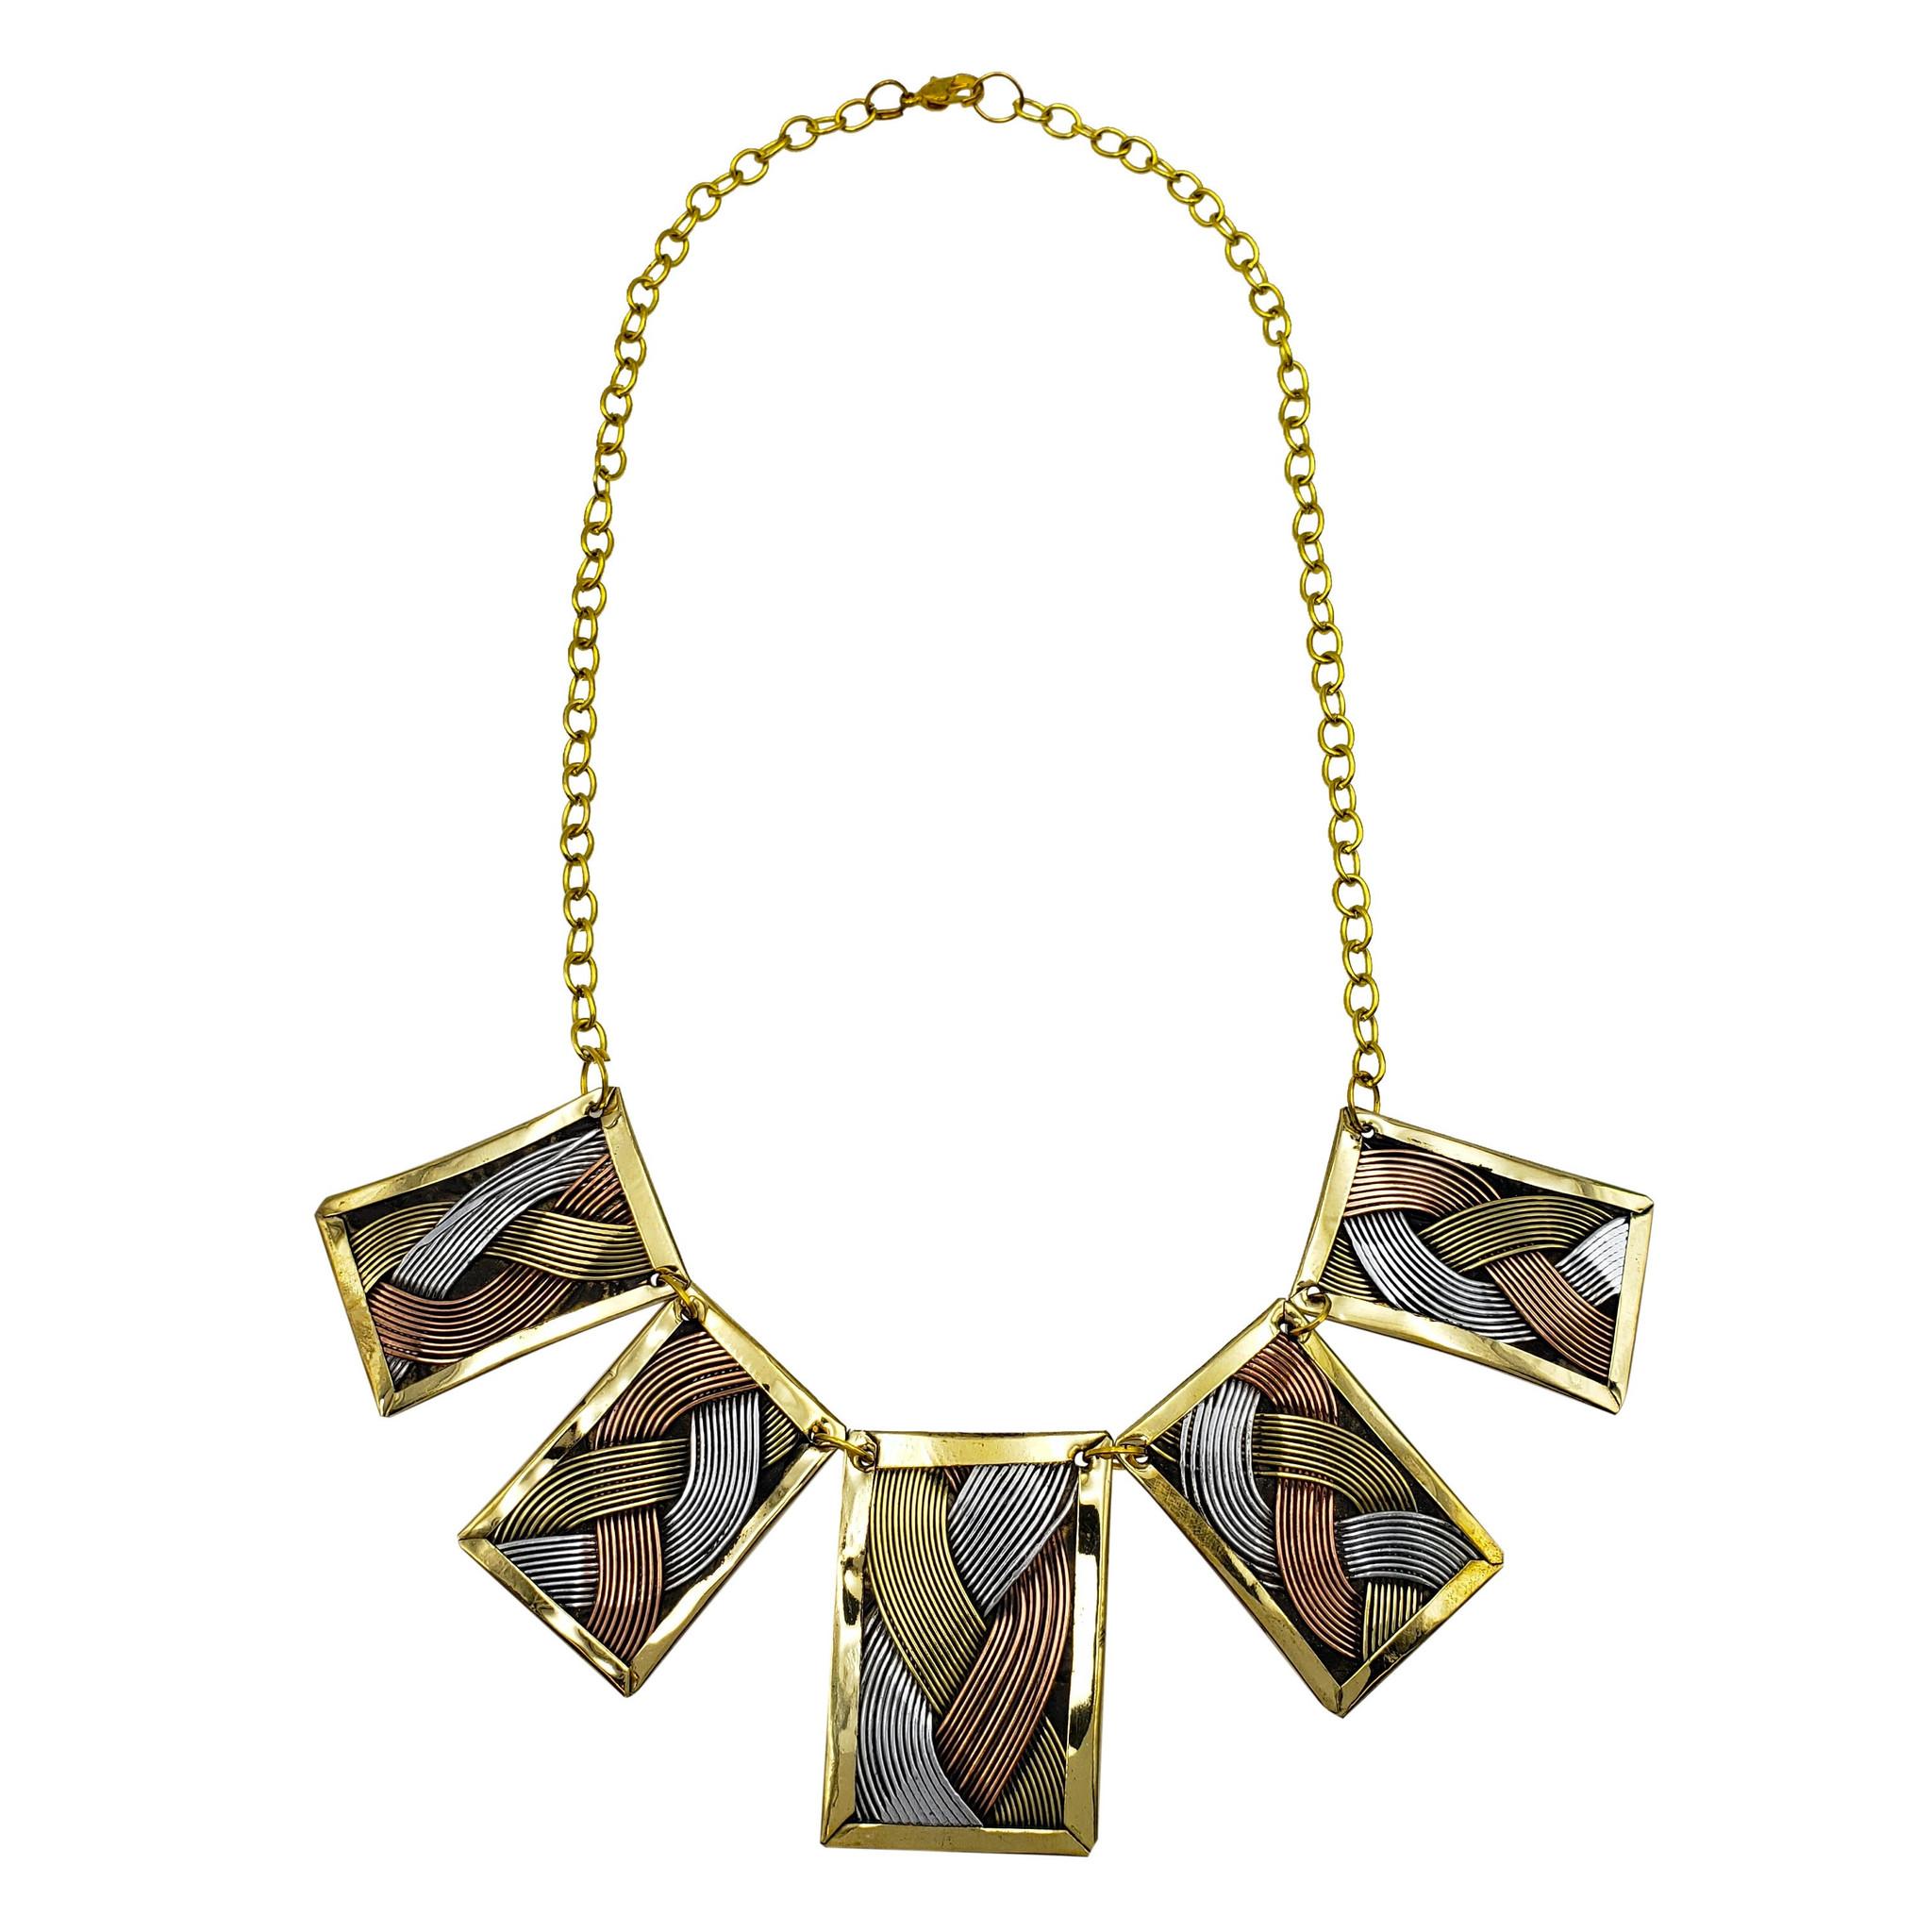 Issa Three Tone Weaved Brass Necklace